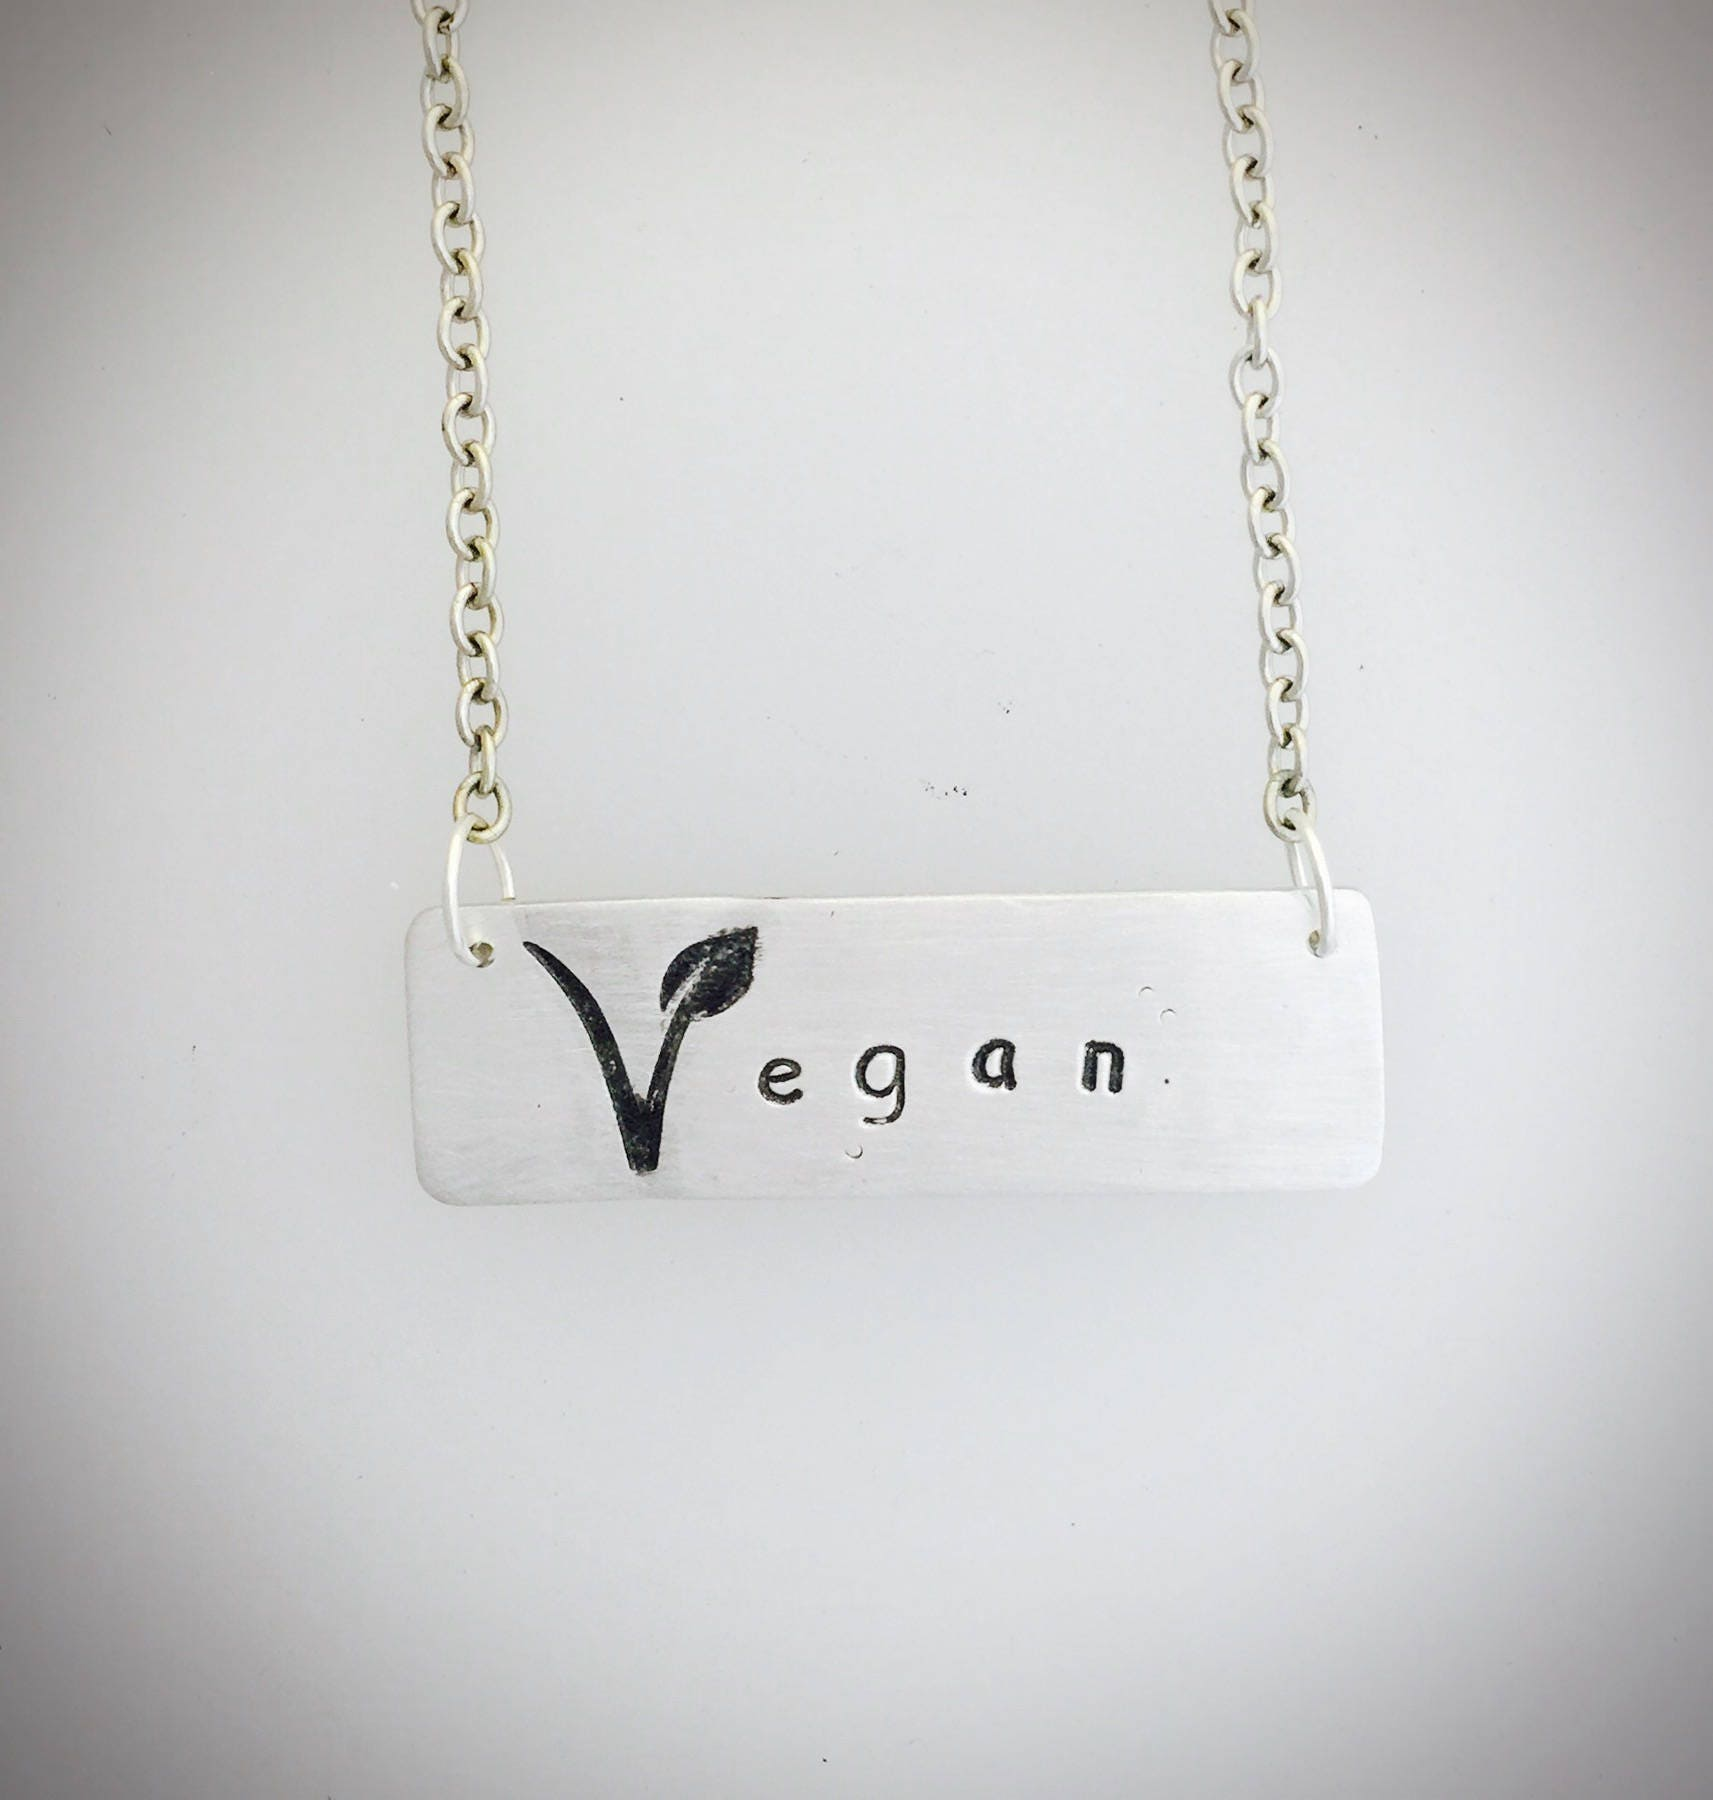 Vegan V Symbol Necklace Vegan Necklace Vegan Jewelry Vegan Gift